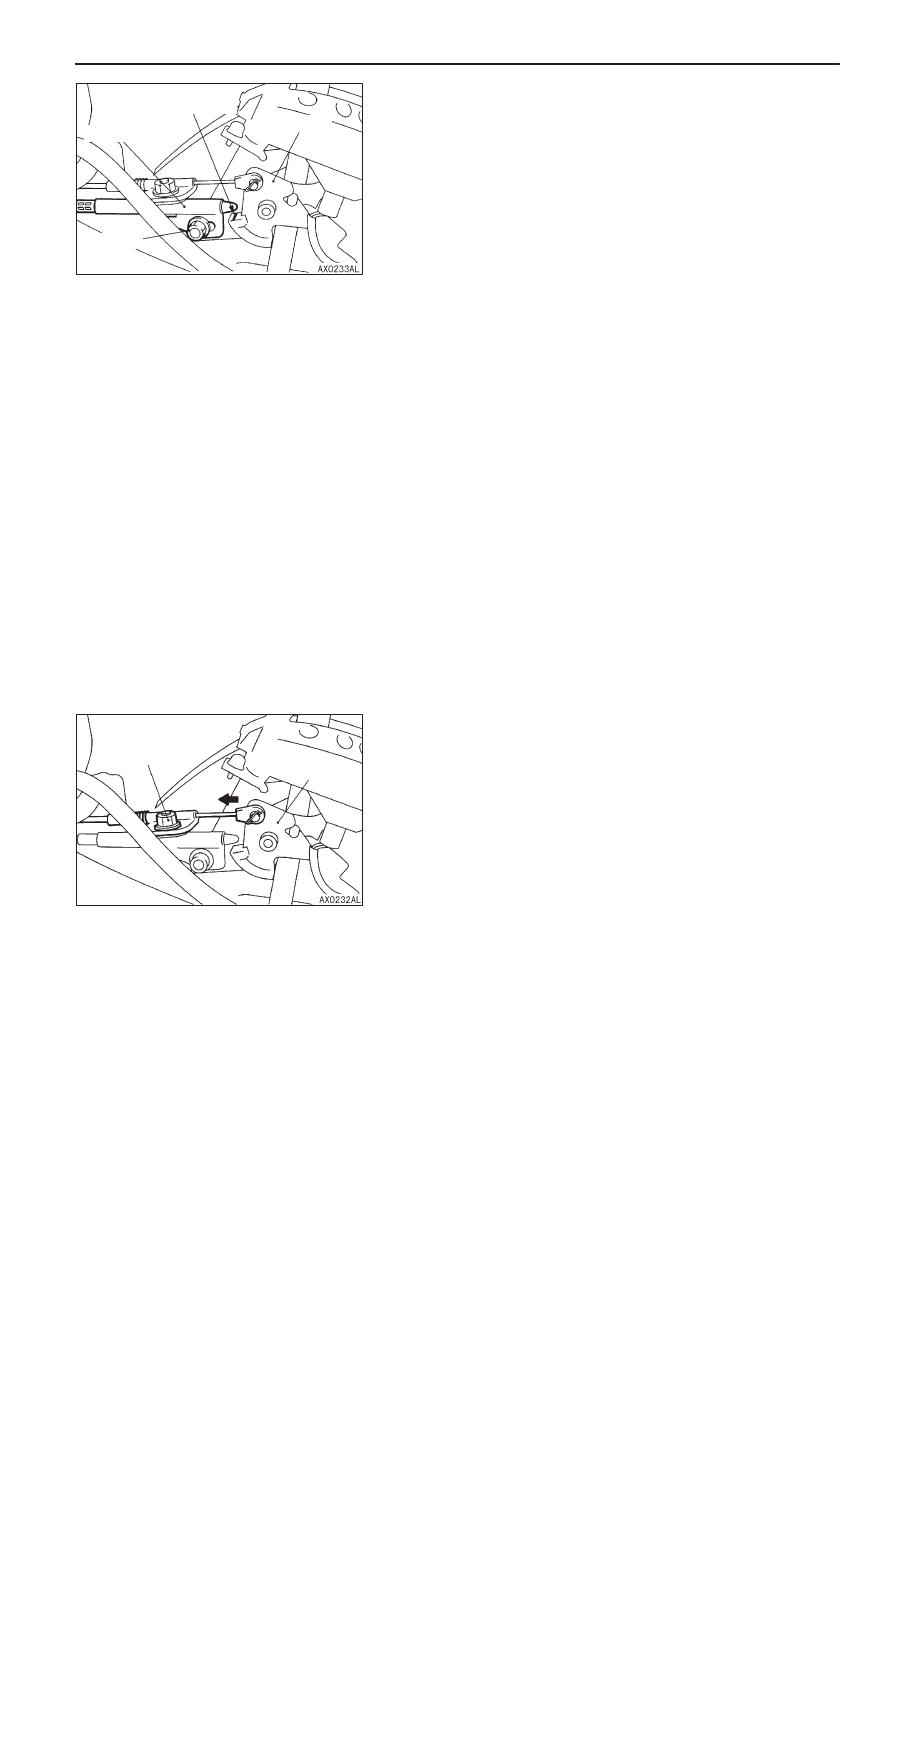 Mitsubishi Pajero Pinin Manual Part 186 Transmission Bushing Diagram Automatic